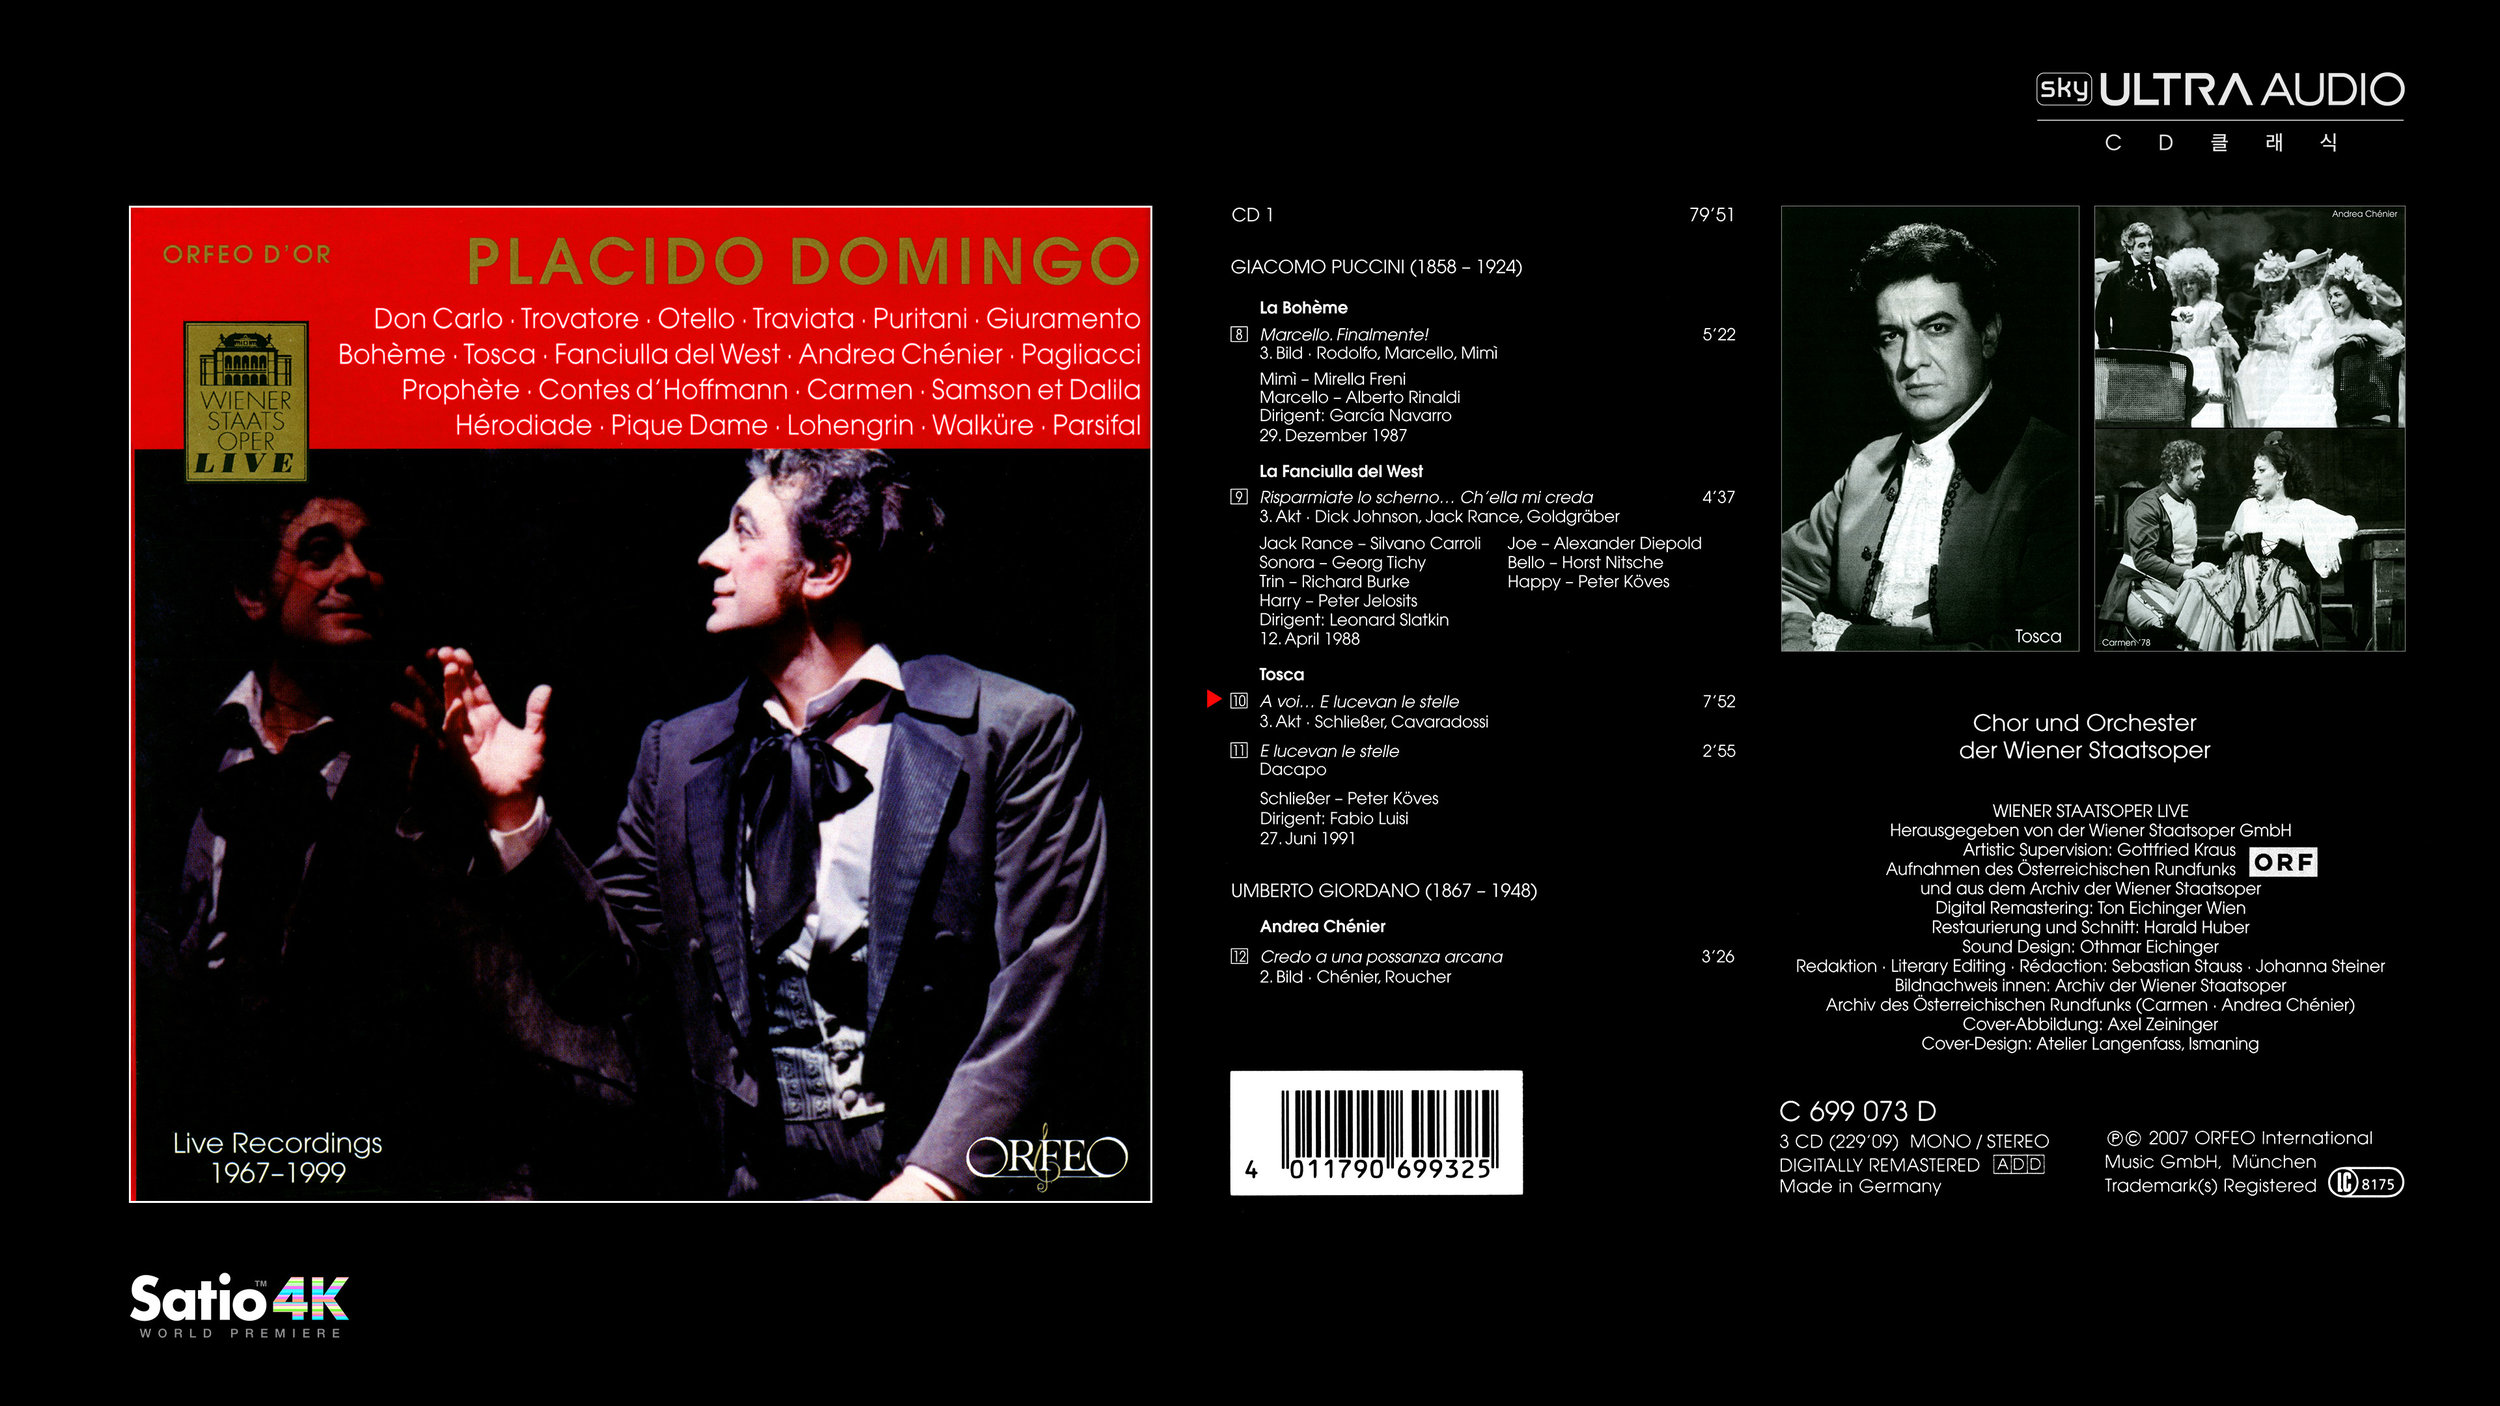 Placido Domingo_Live Recordings 1967-1999 (Orfeo).jpg